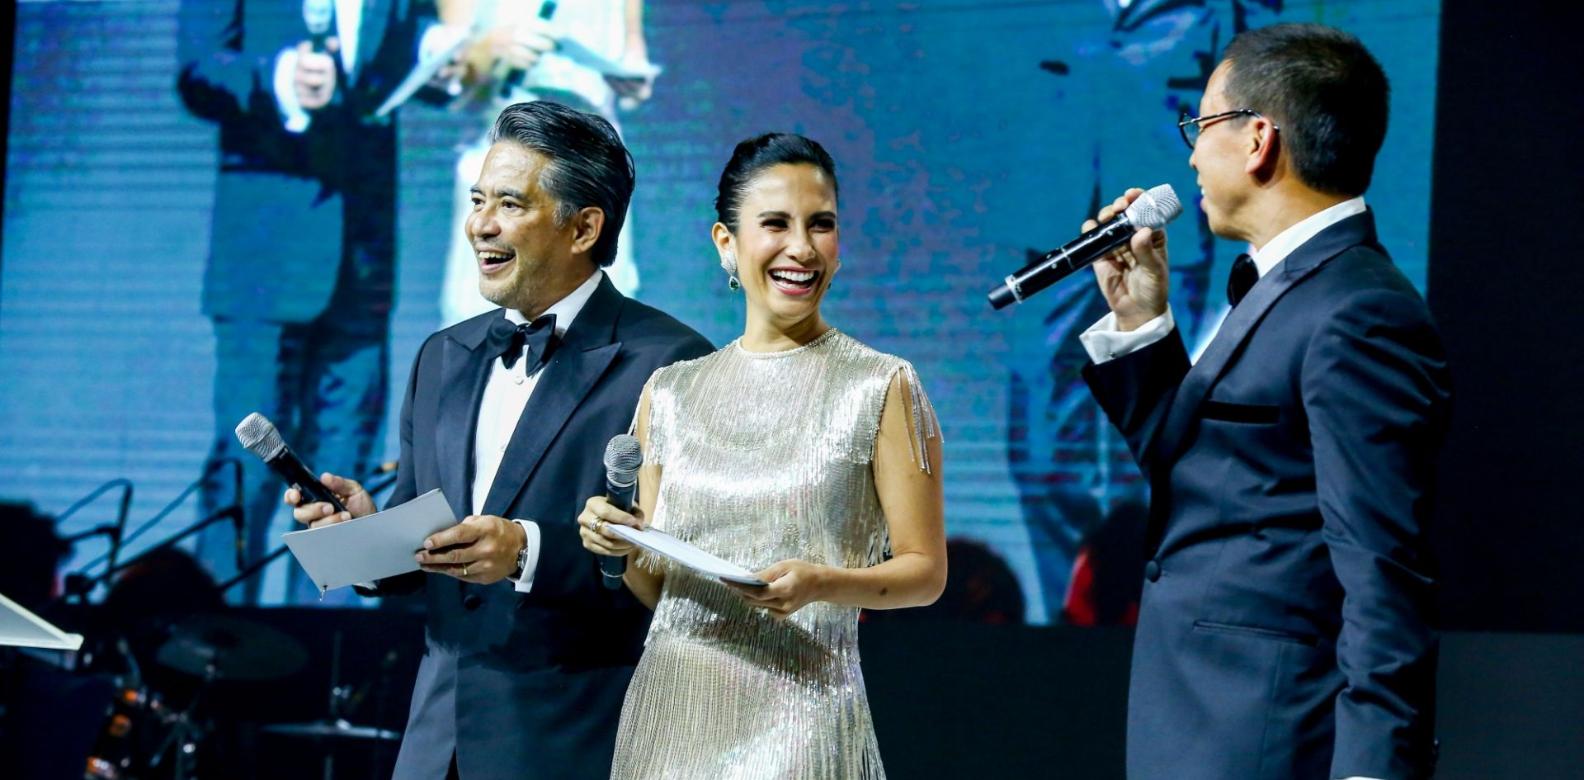 Dr. Randy Francisco, Stephanie Zubiri-Crespi, and Kim Atienza host the charity auction